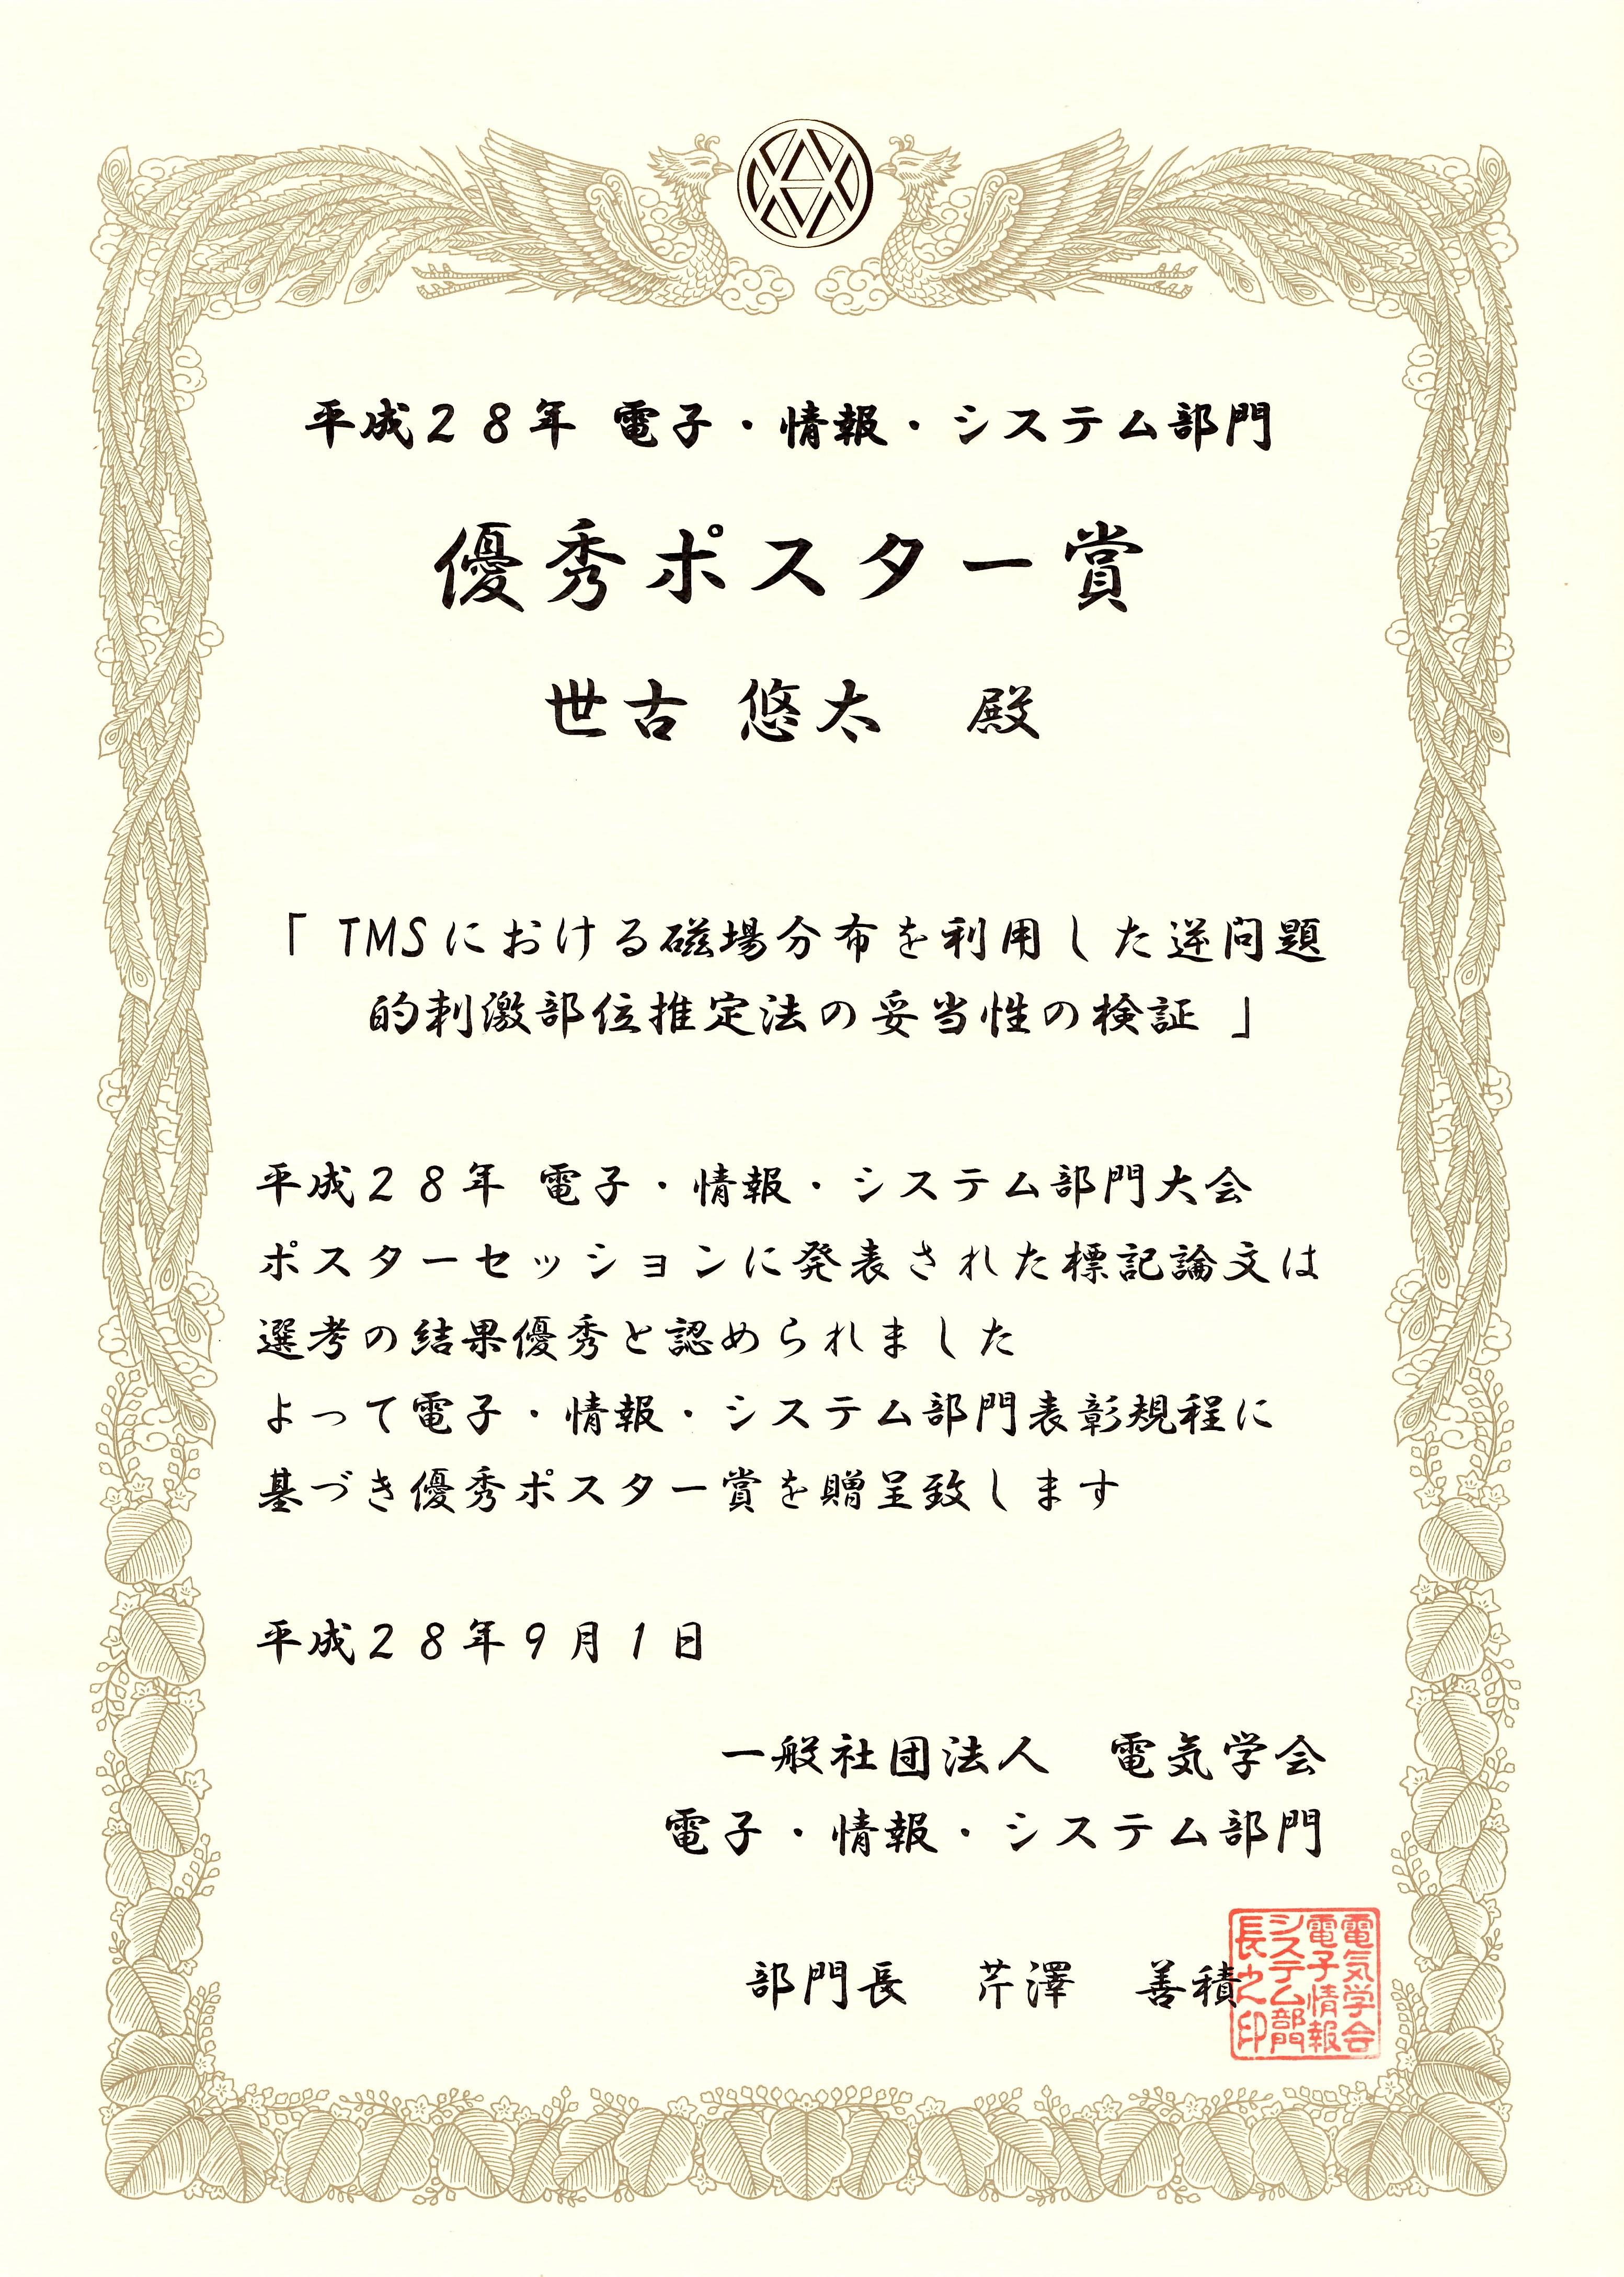 http://www.maebashi-it.ac.jp/department/sle/upload/c65c055c457532975c651e0524c027e3109c4856.jpg